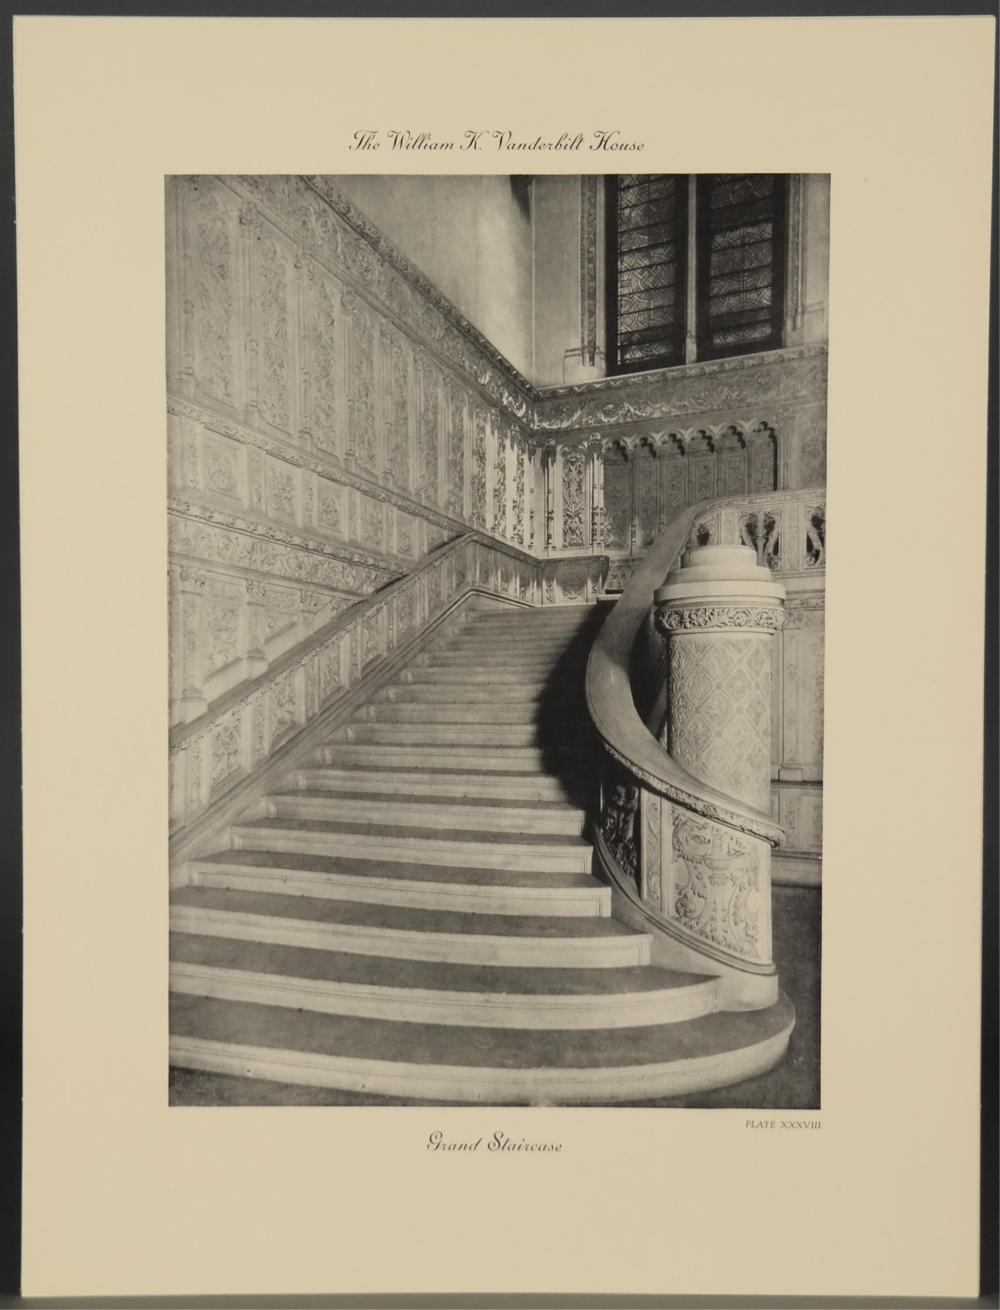 Lot 223: A Monograph of the William K. Vanderbilt House.